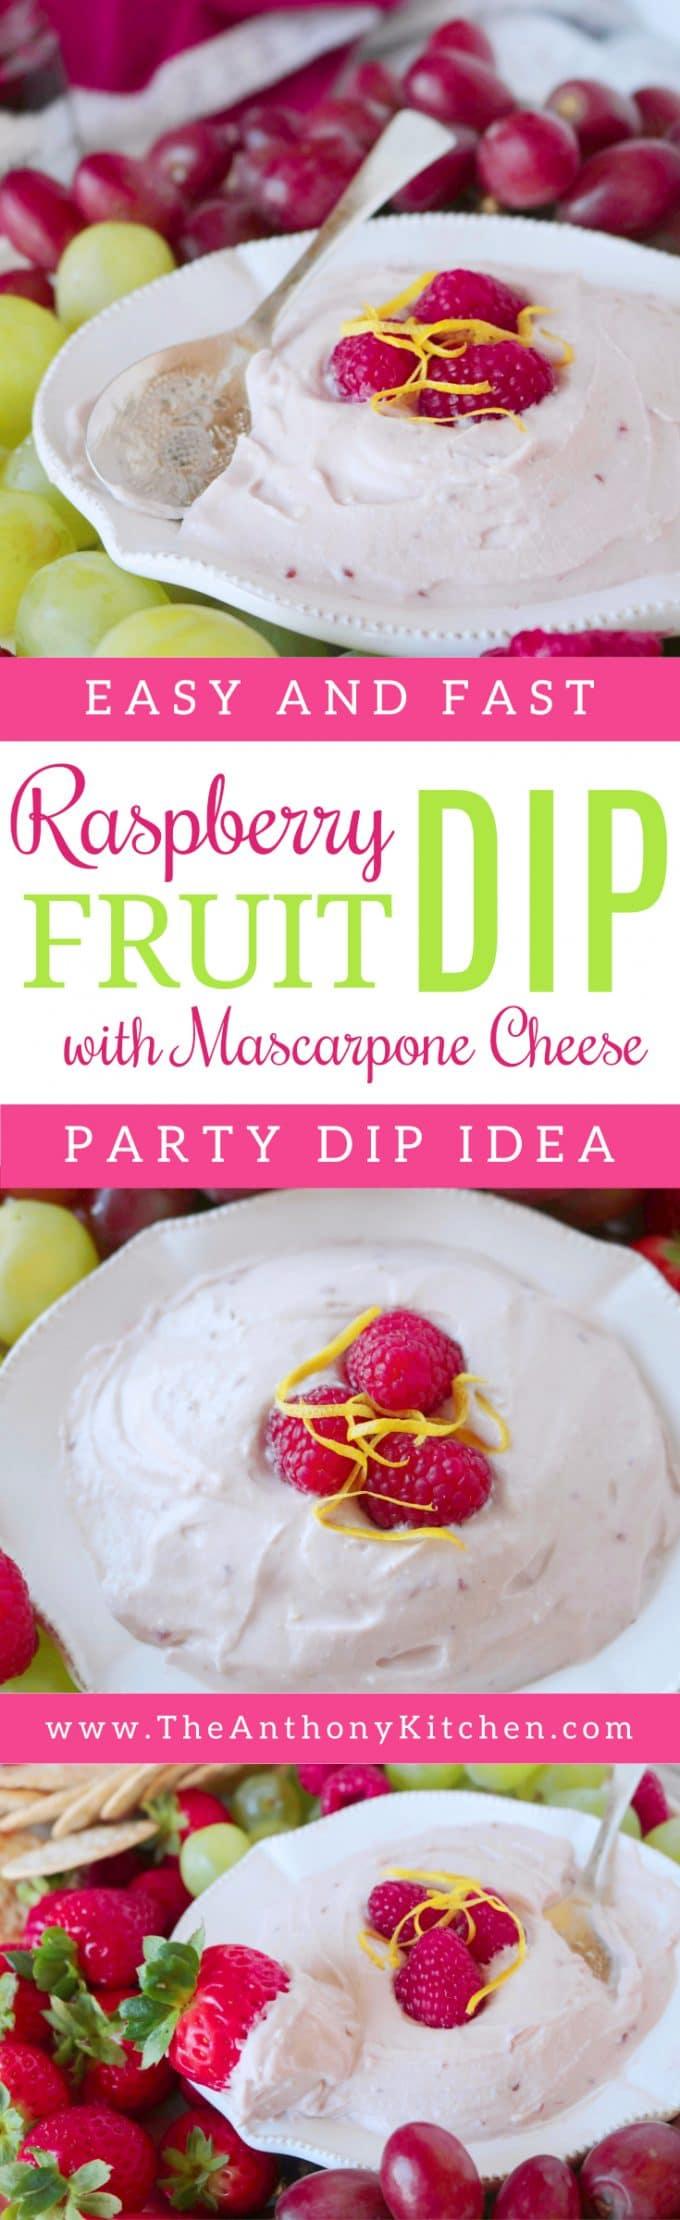 RASPBERRY FRUIT DIP